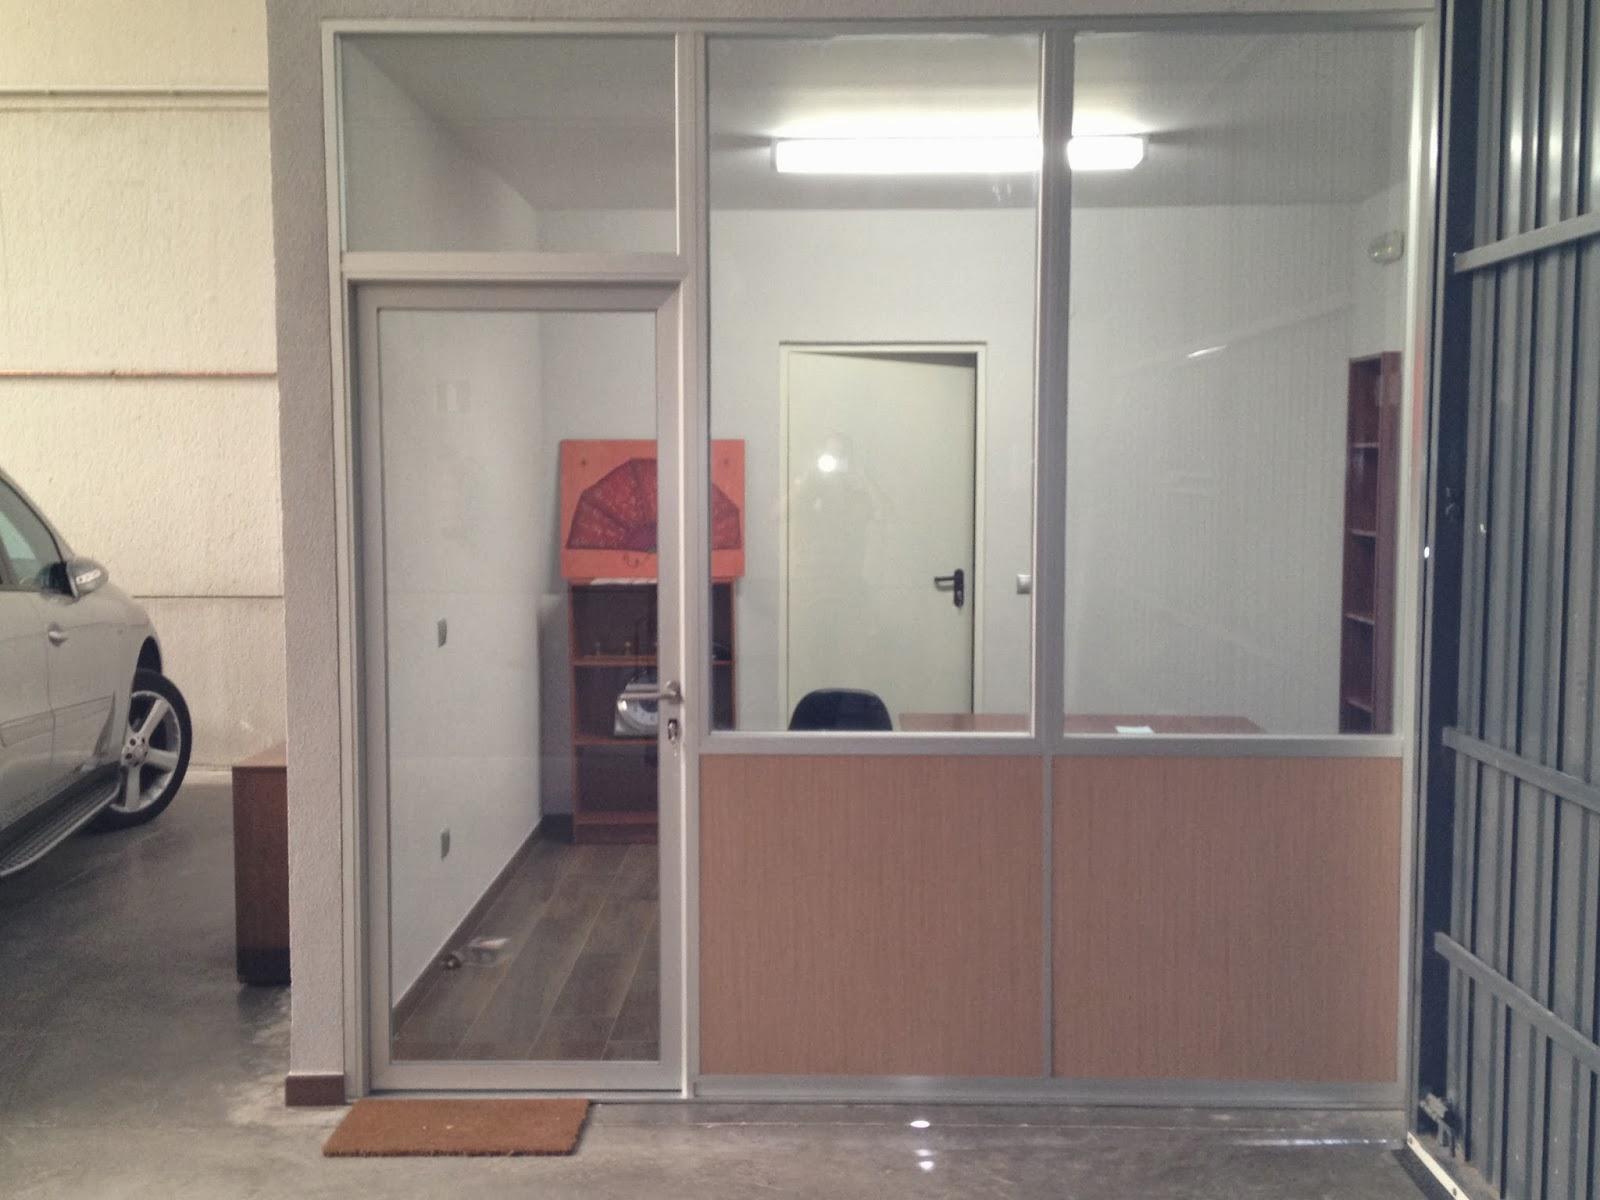 Mamparas de oficina dise o fabricaci n y montaje for Espacios para oficinas